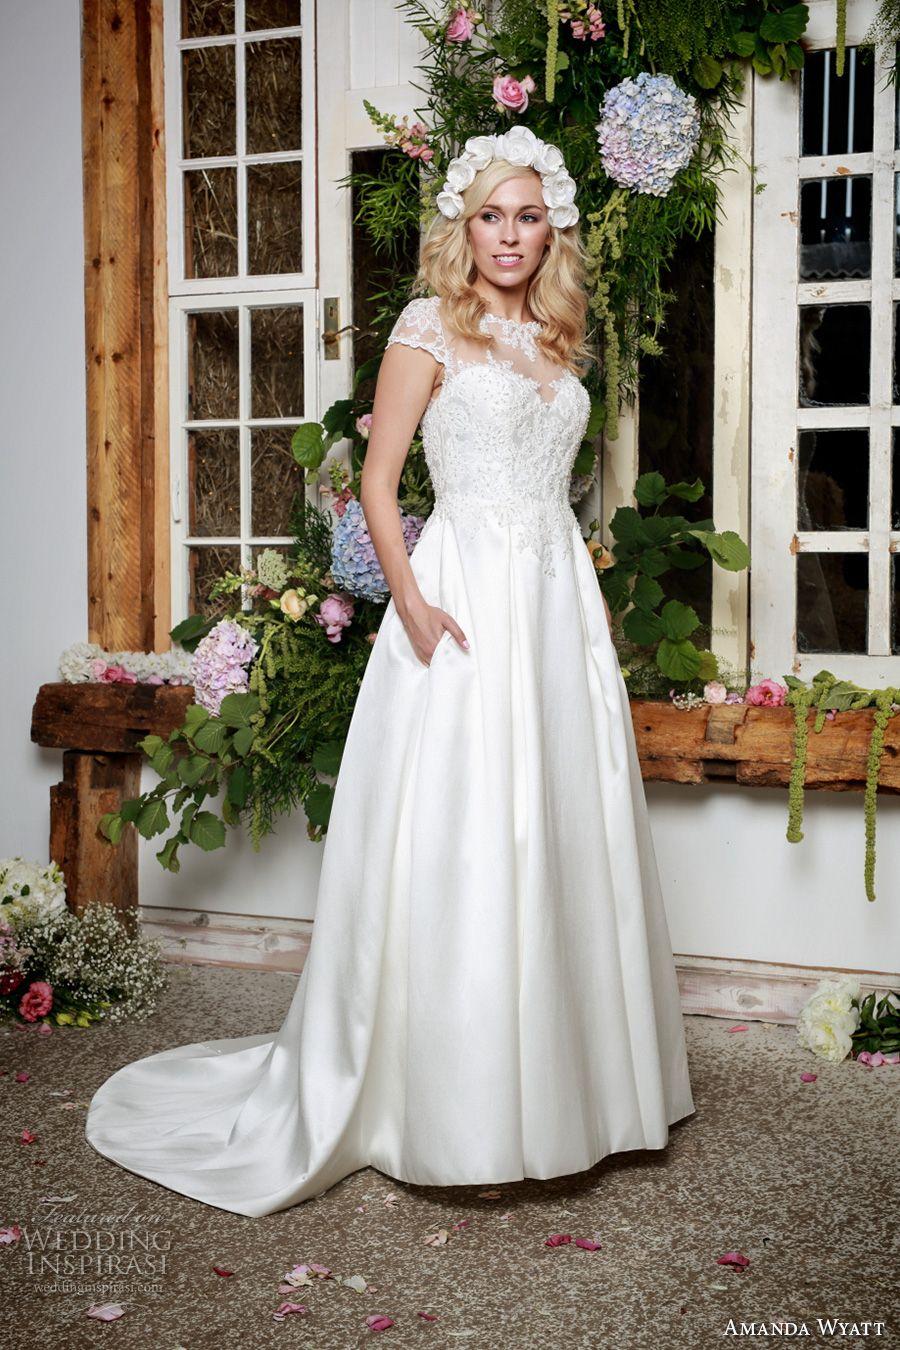 Amanda wyatt ucshe walks with beautyud bridal collection amanda